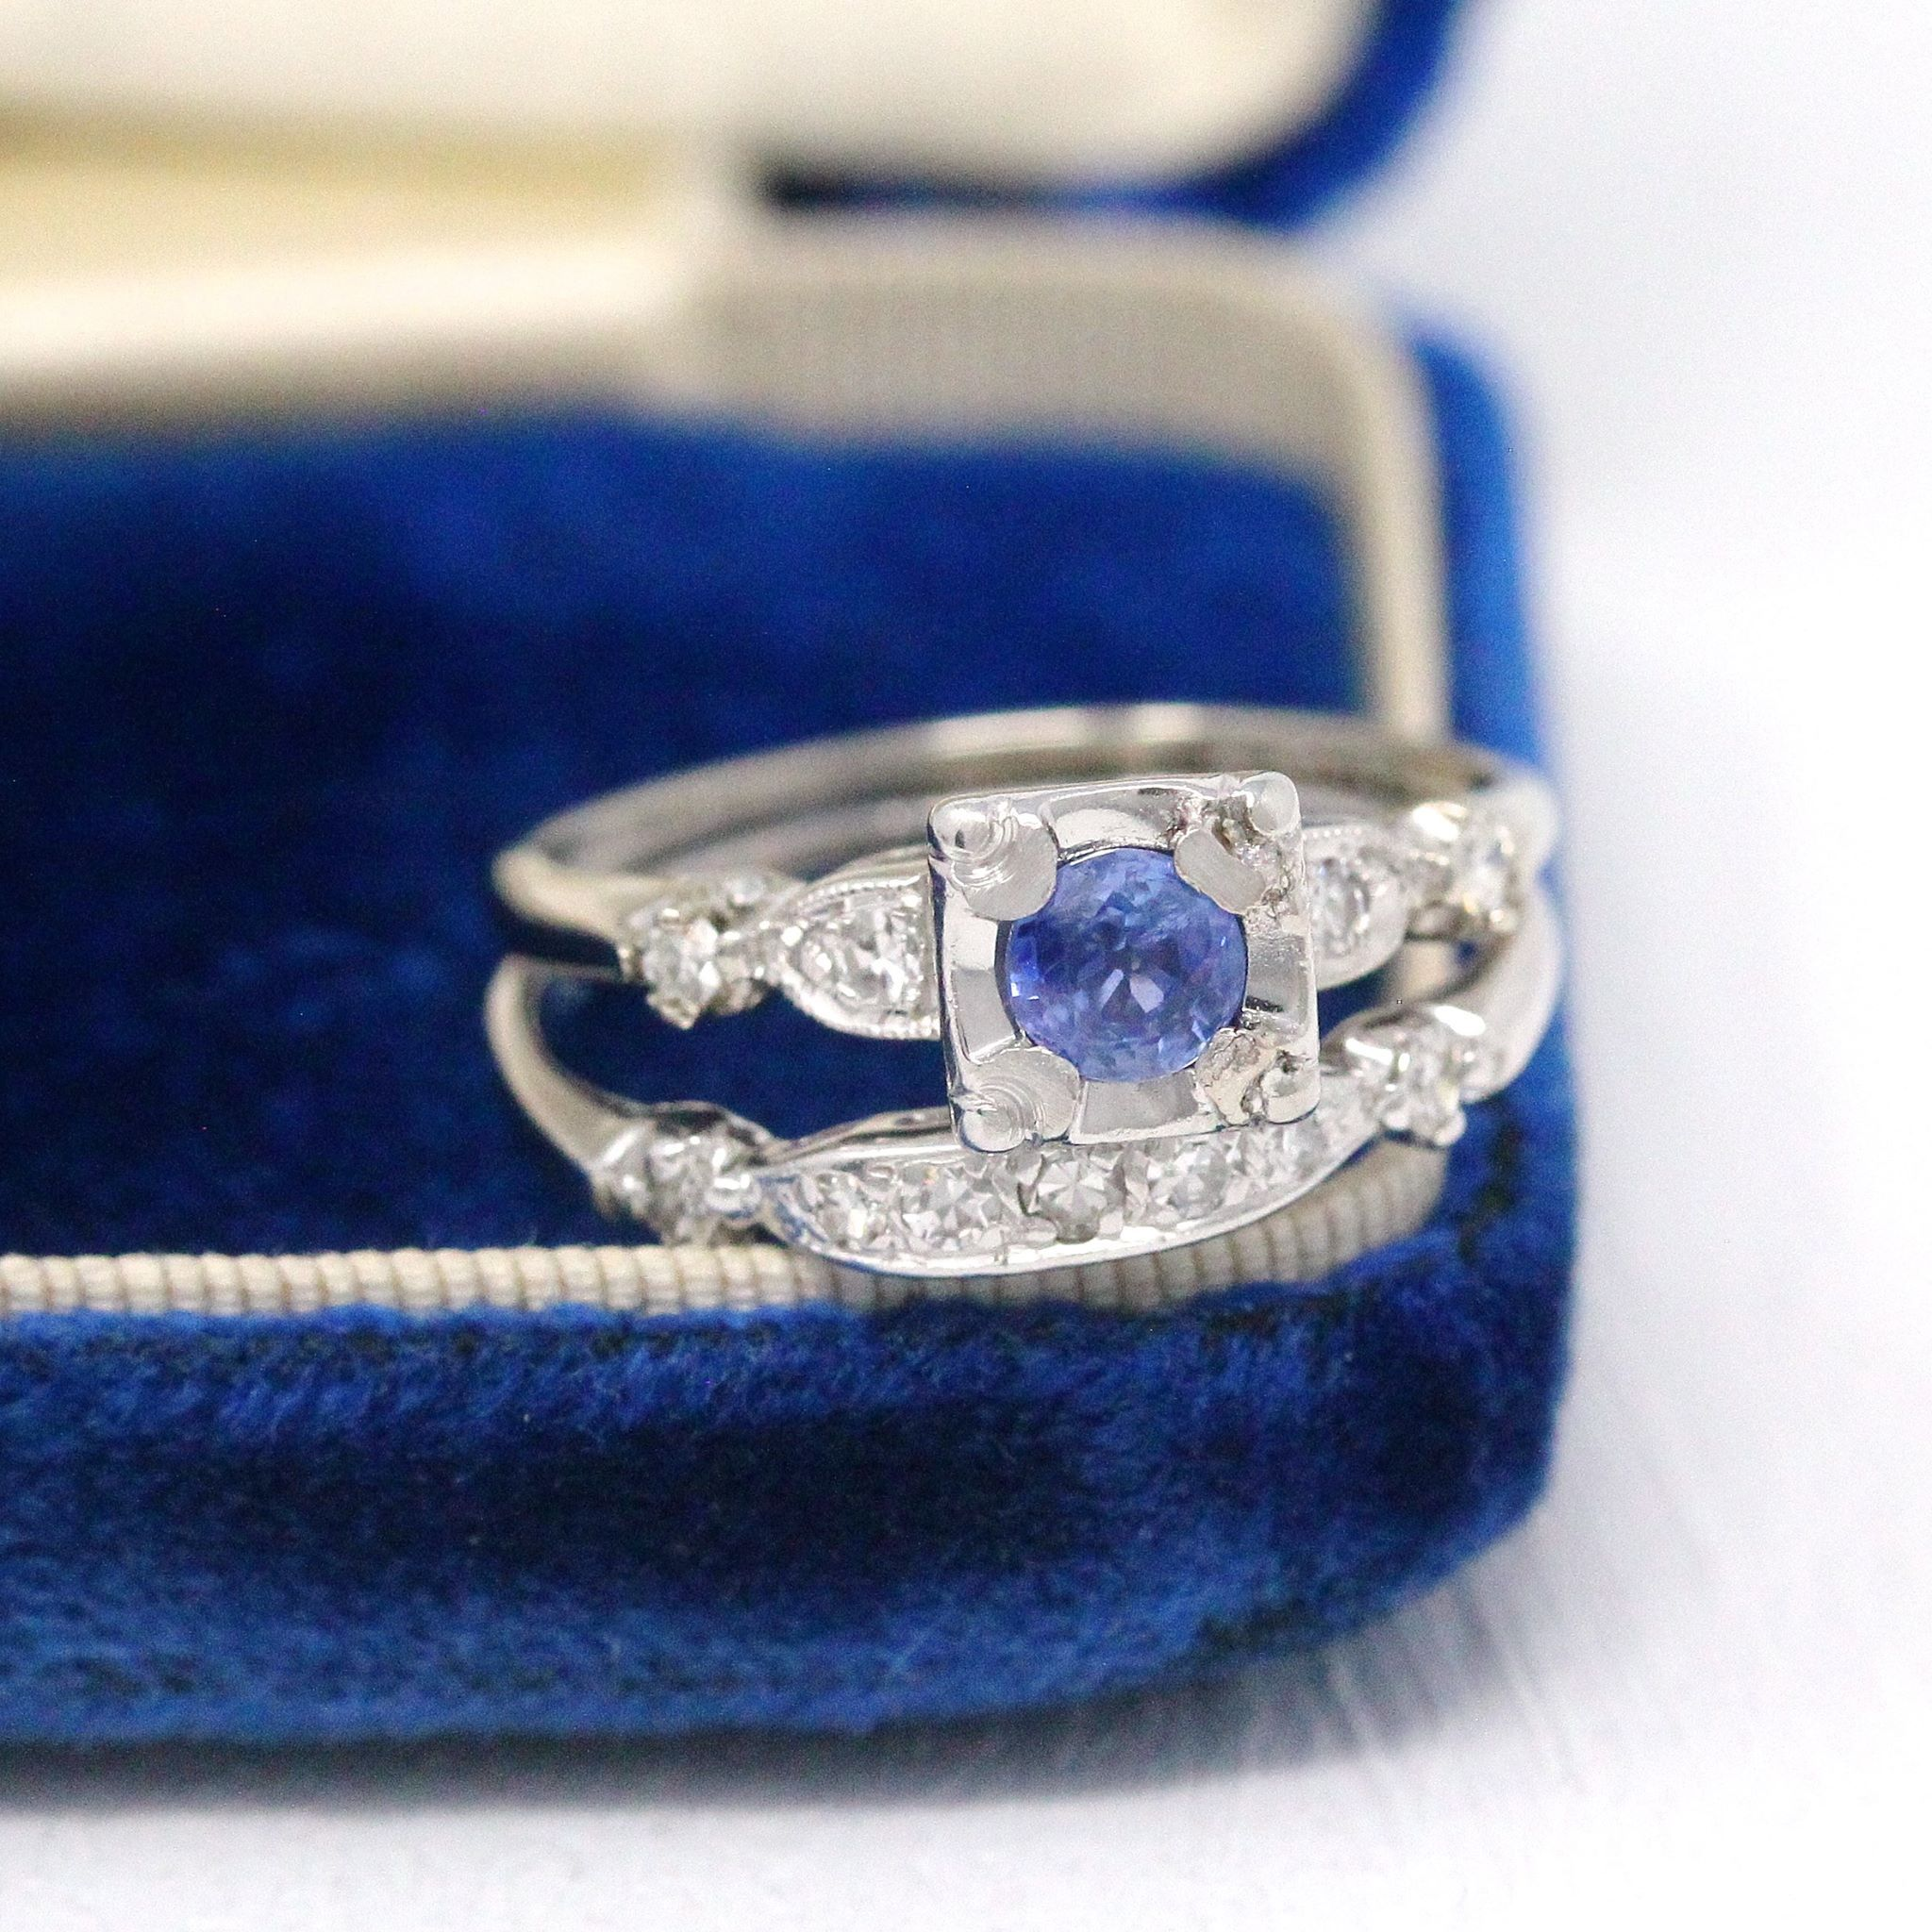 A stunning vintage 14k white gold sapphire & diamond